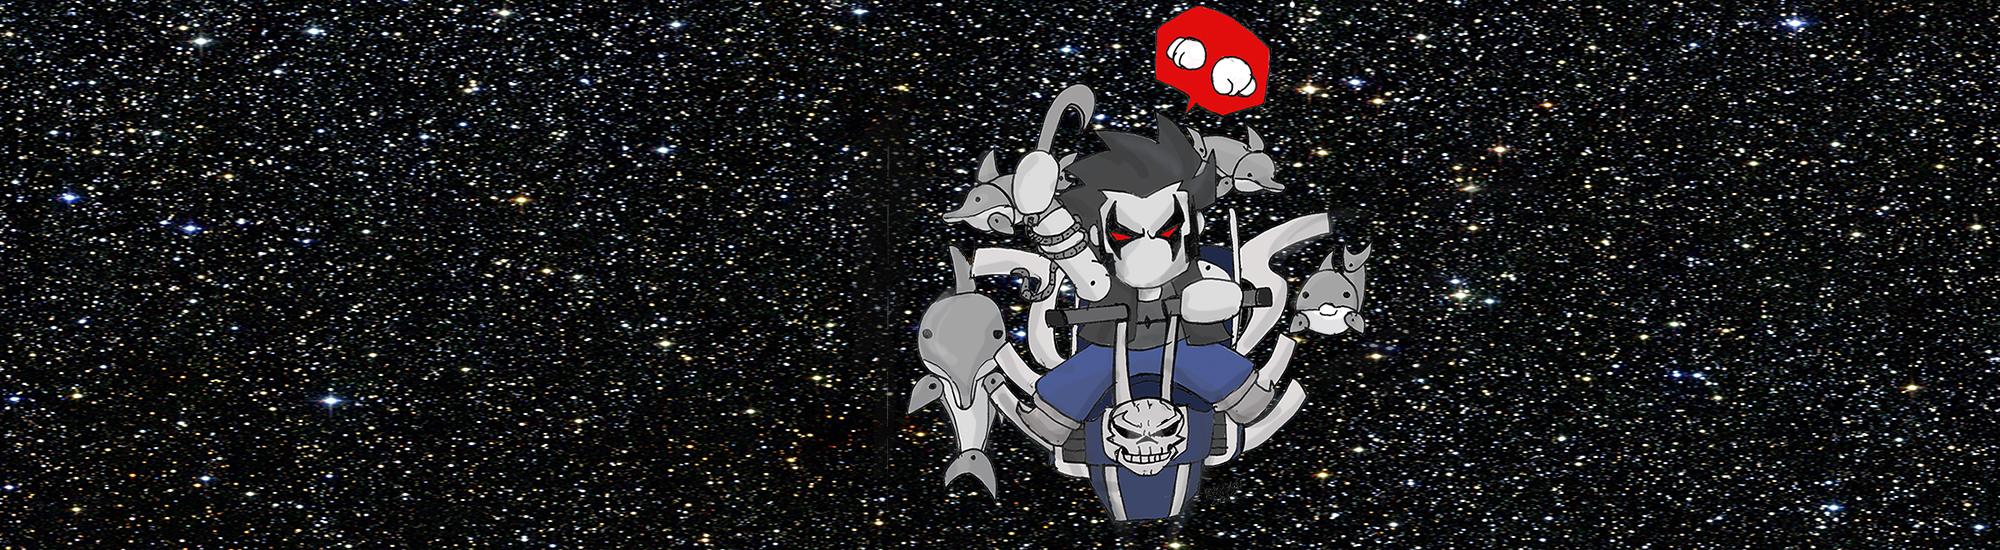 DC Unmasked Lobo by rugdog